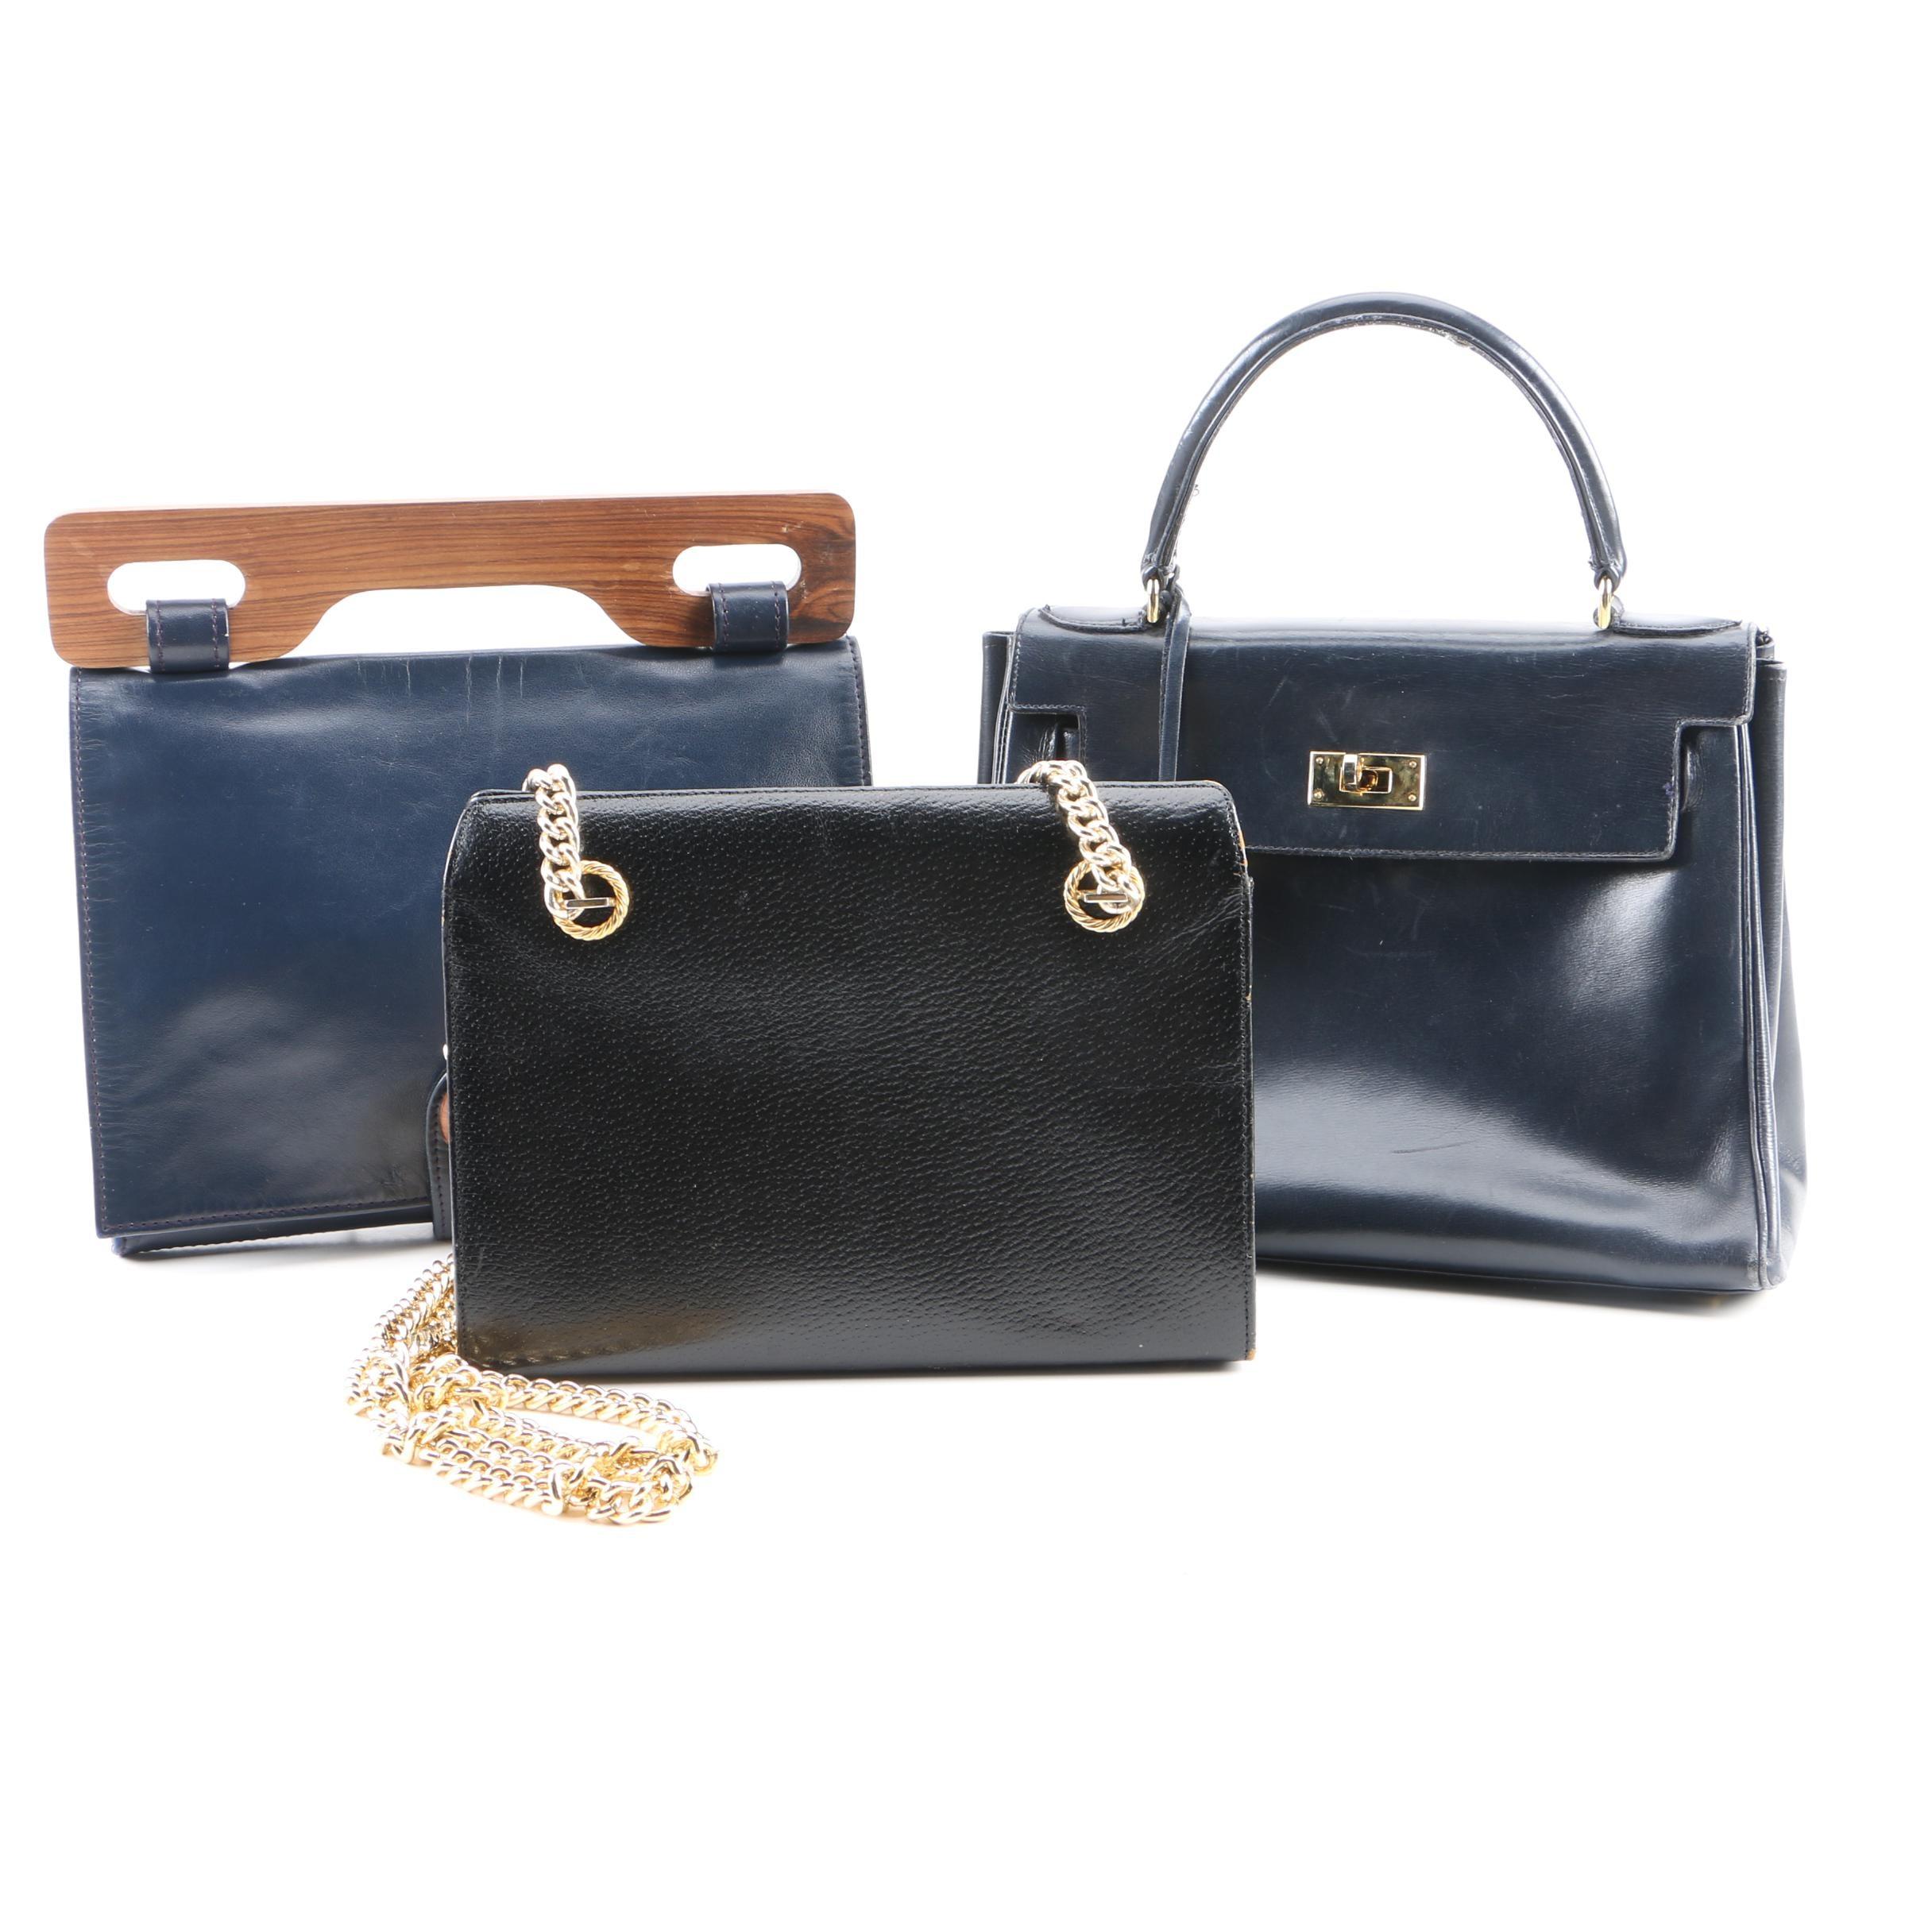 Vintage Koret Black Leather Handbag and Navy Blue Leather Handbags